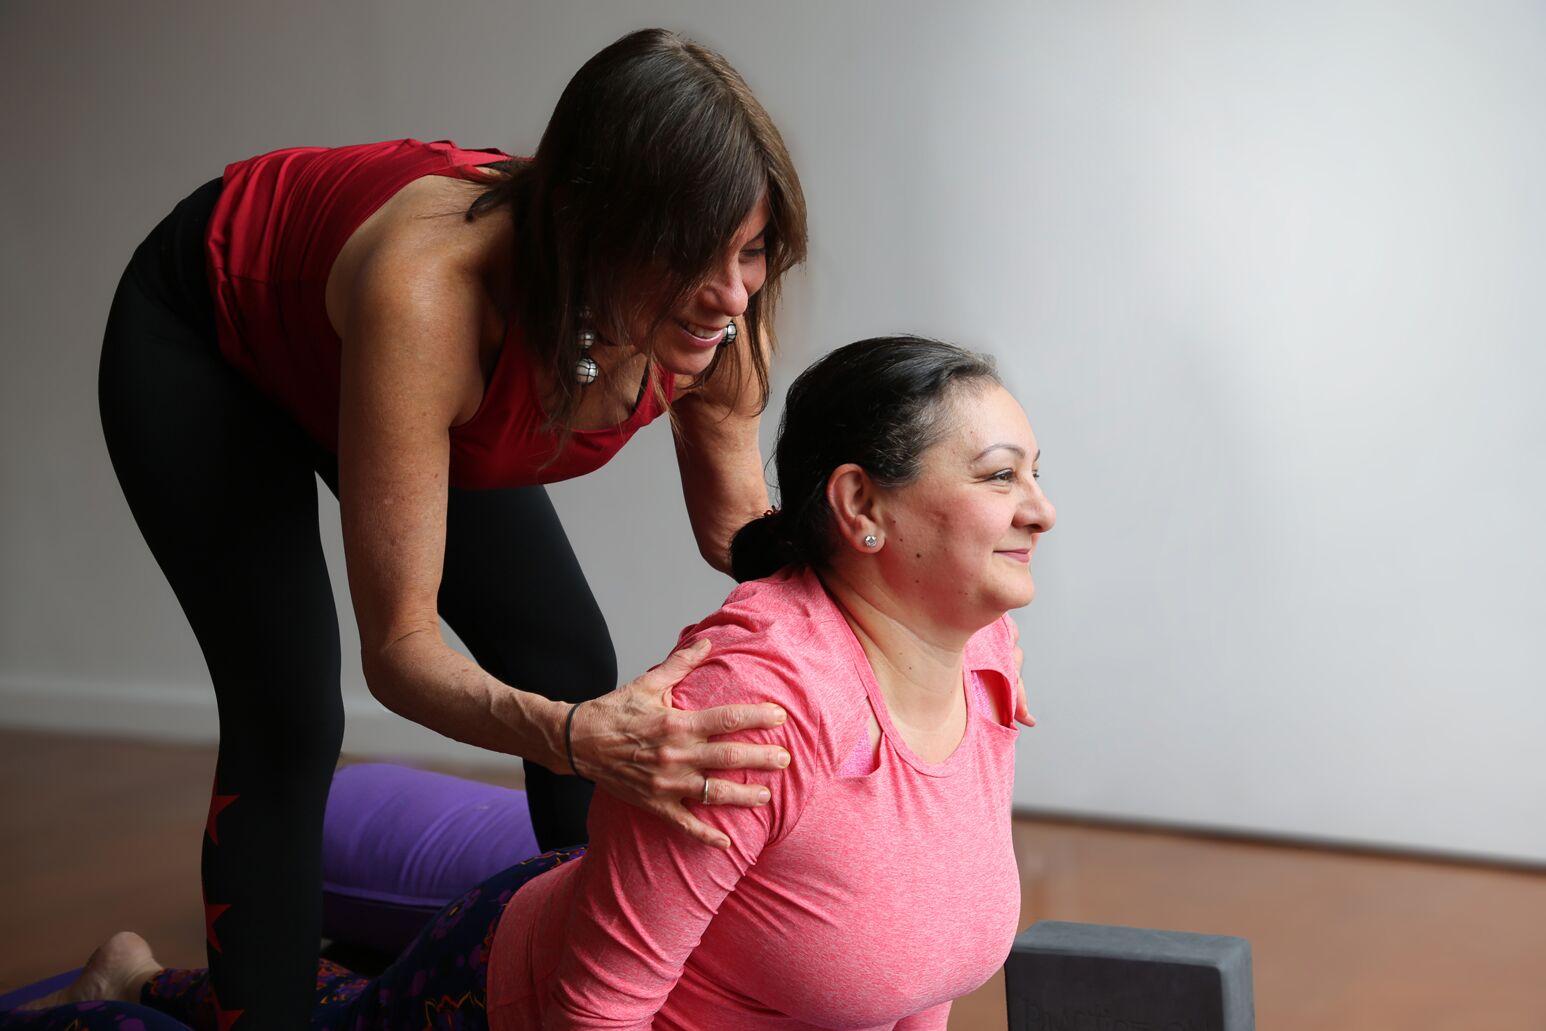 Kathy Khodadadi with her yoga trainer